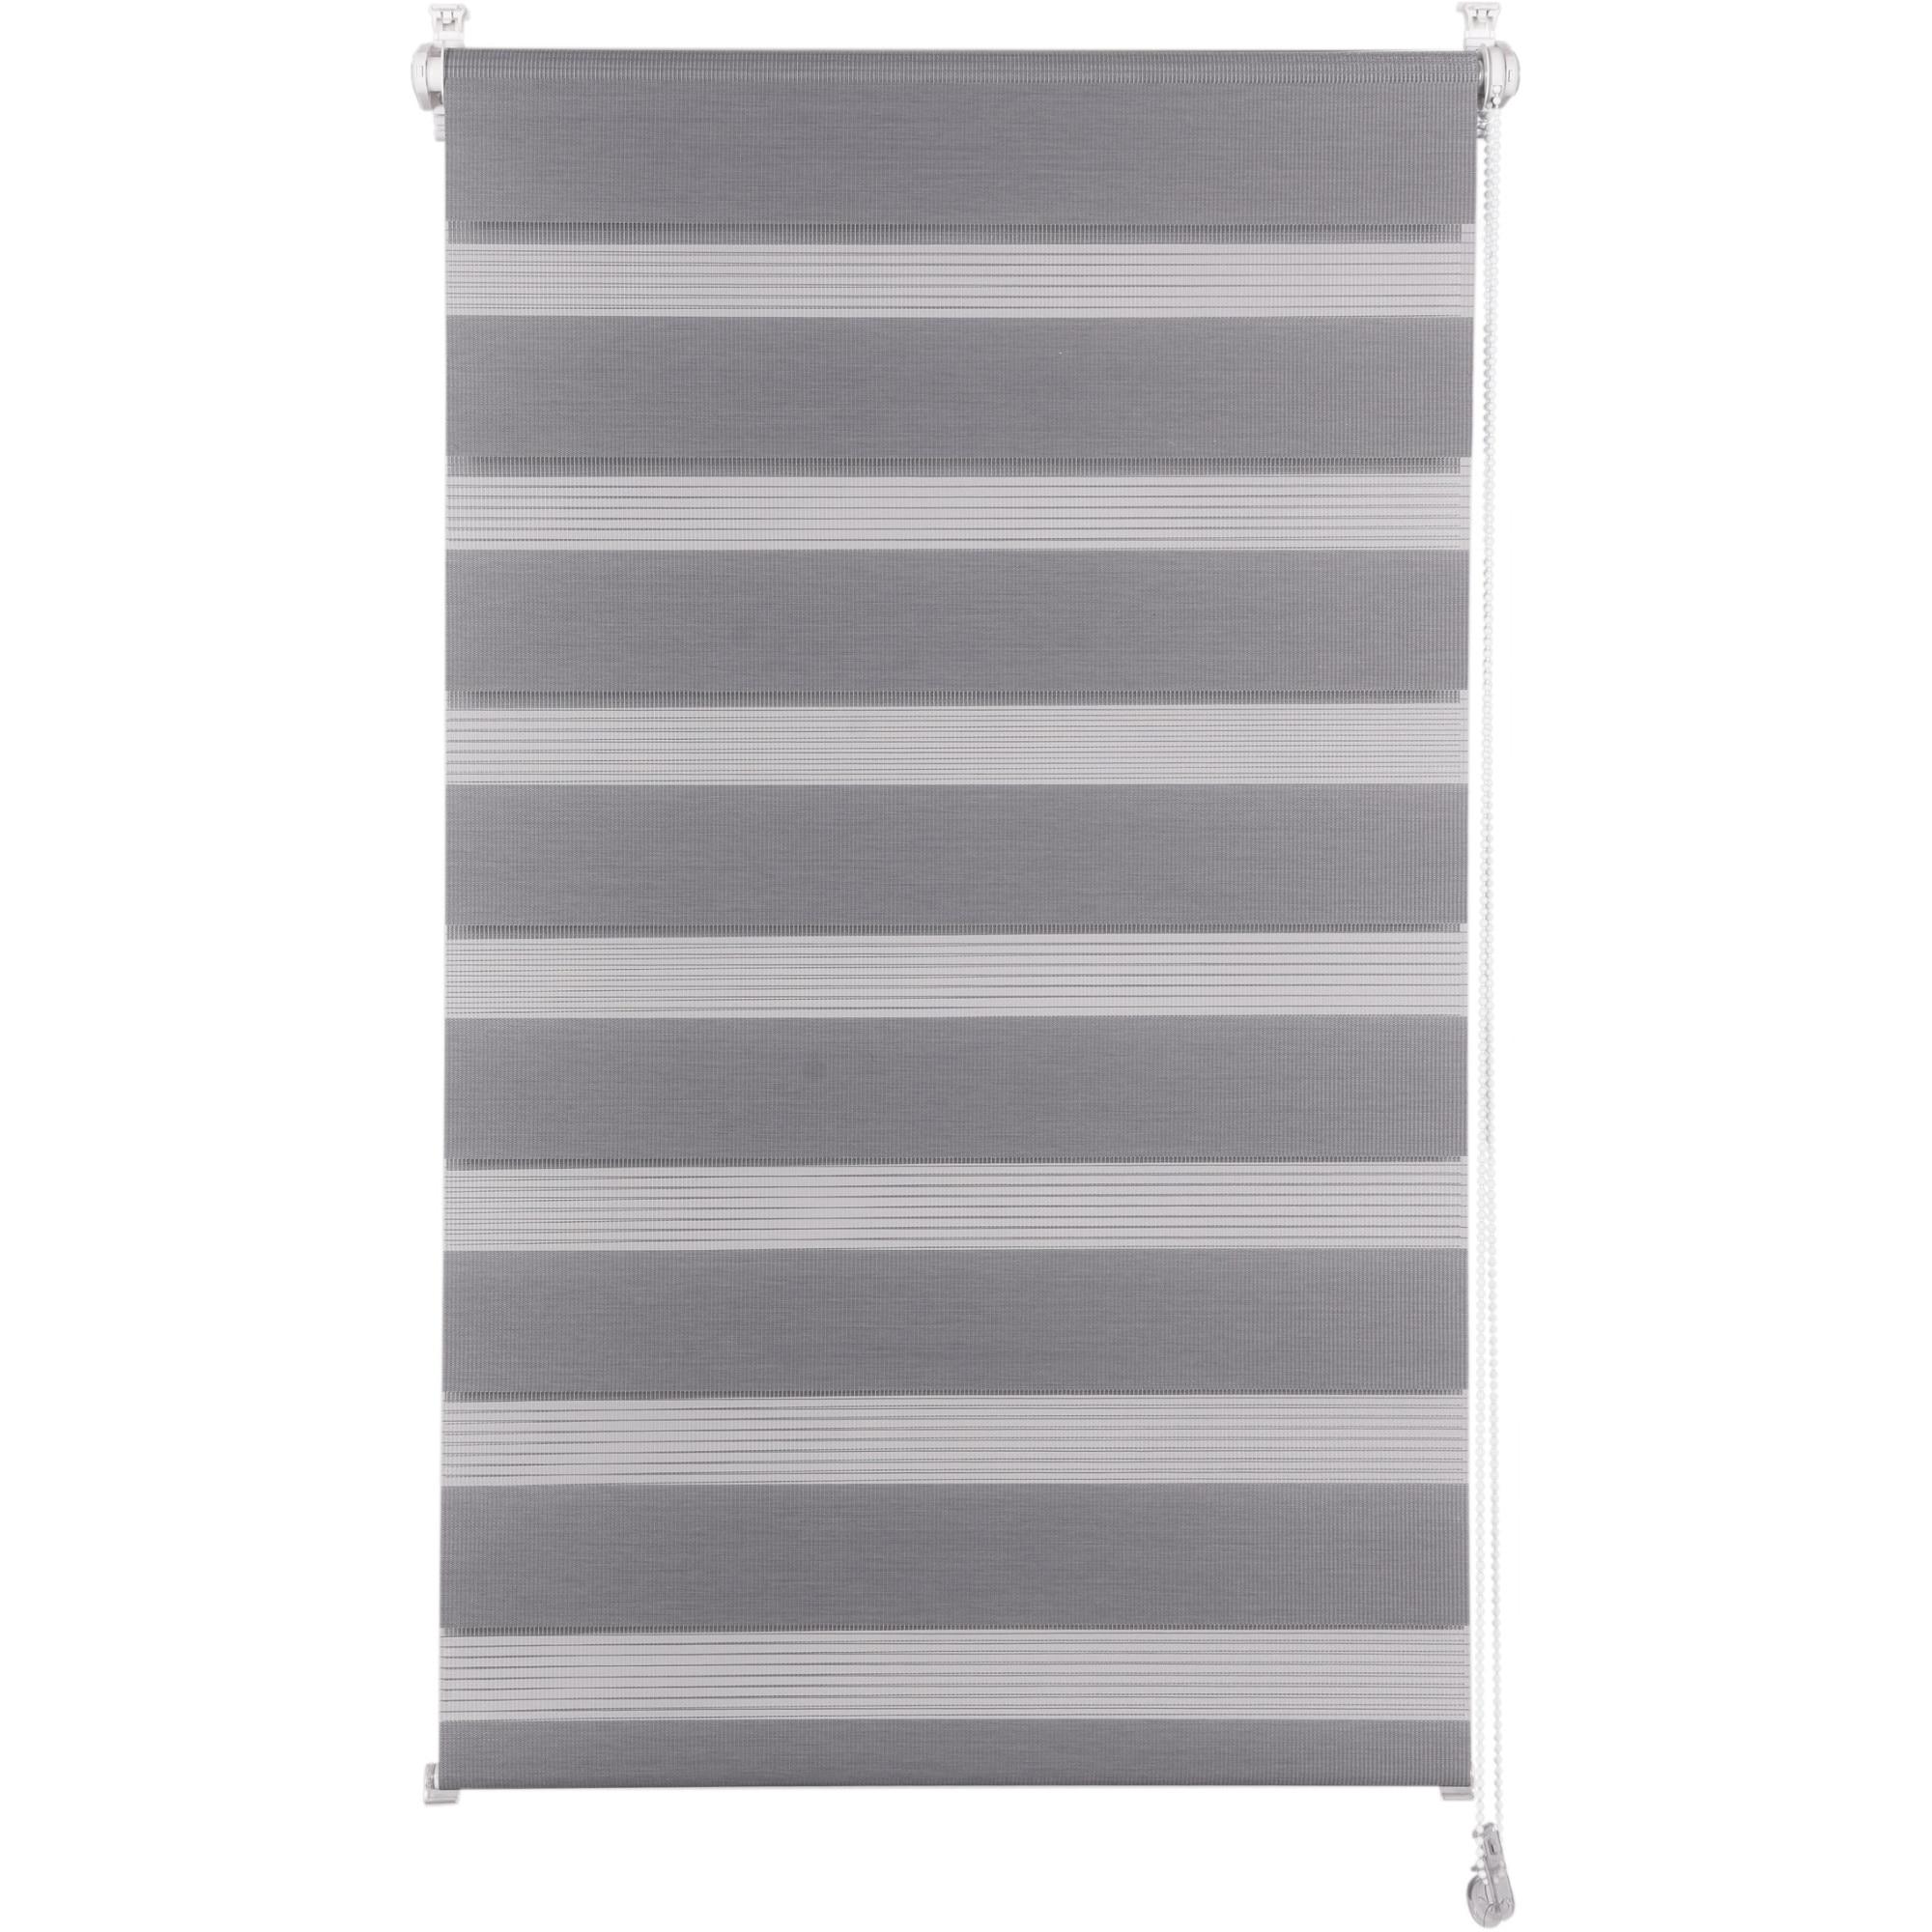 Fotografie Rulou textil zebra Kring, 100% poliester, 120 gsm , 56x150 cm, Gri